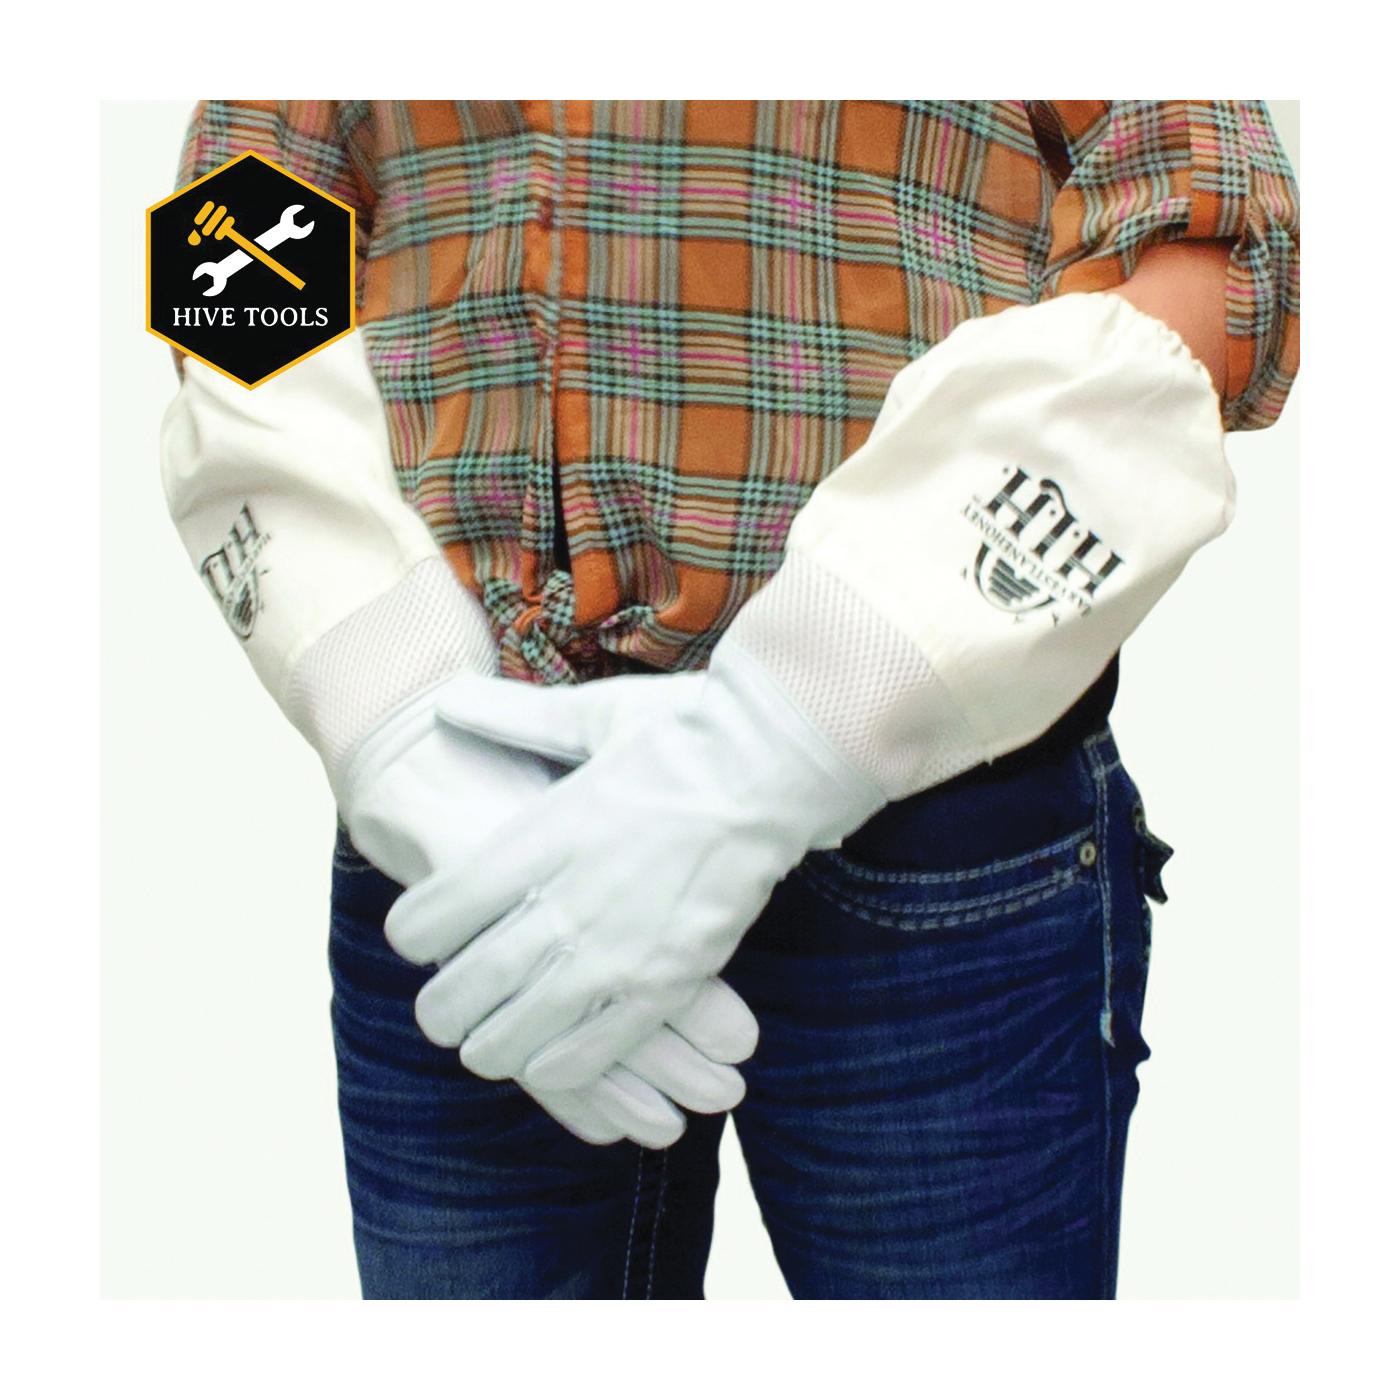 HARVEST LANE HONEY CLOTHGXS-103